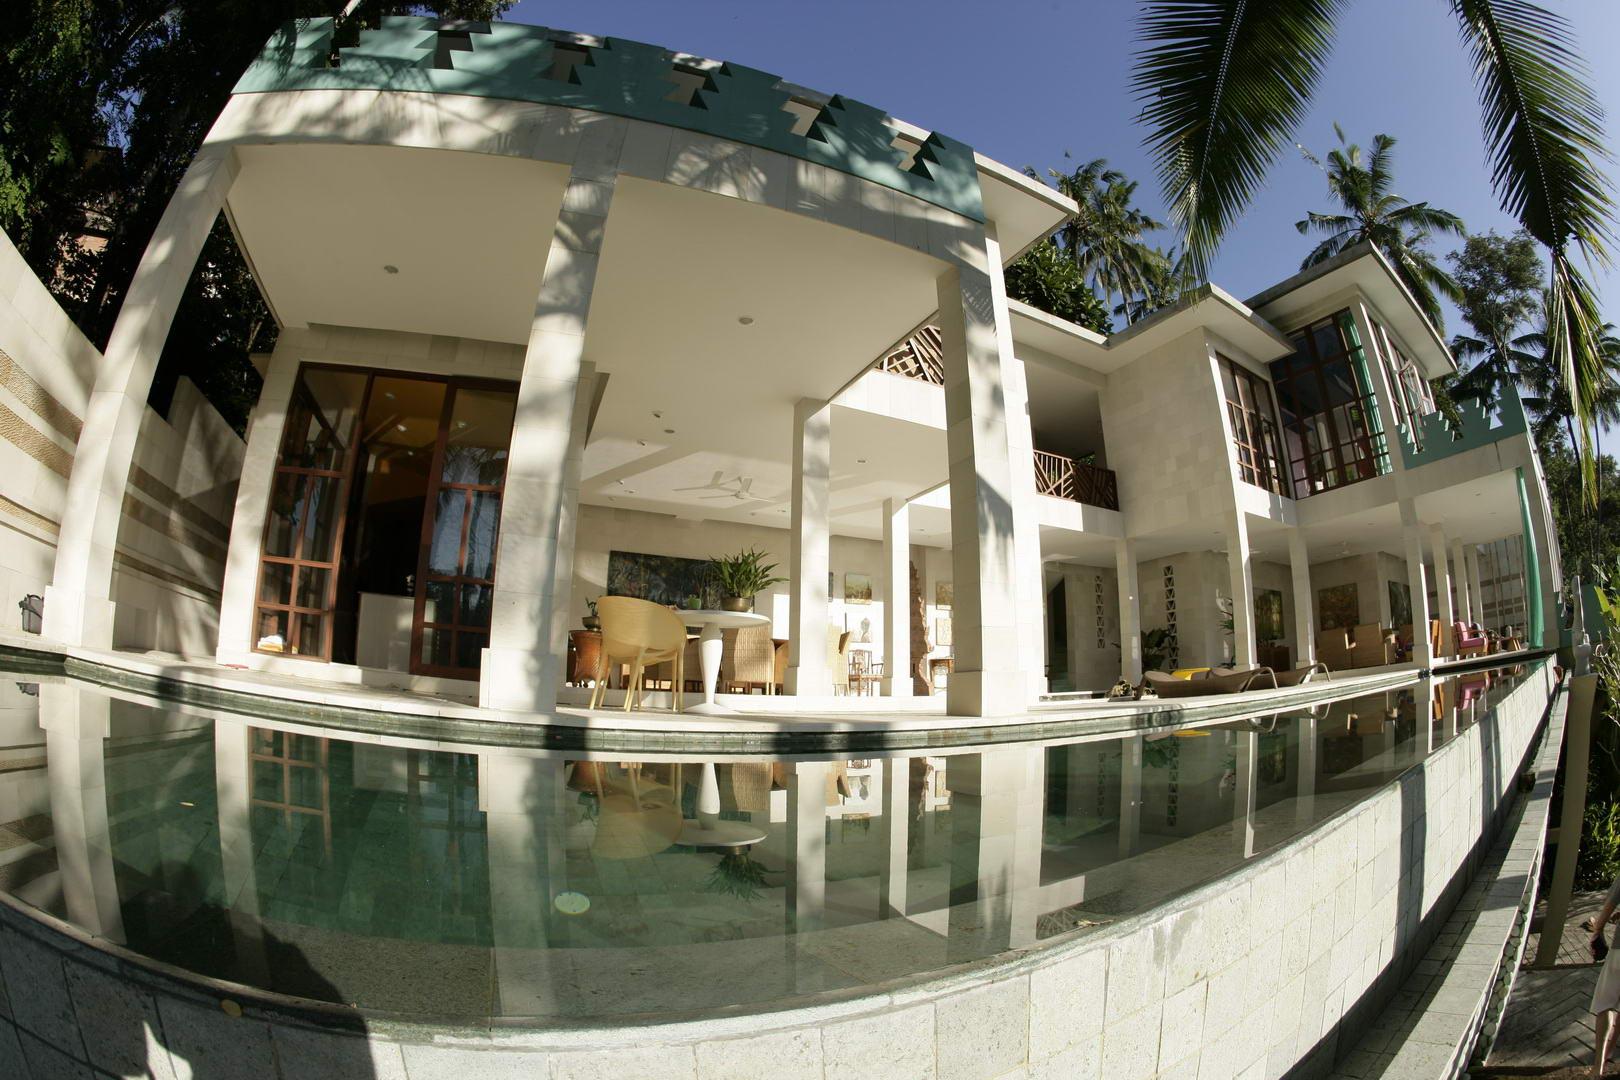 Eriks Bali 215